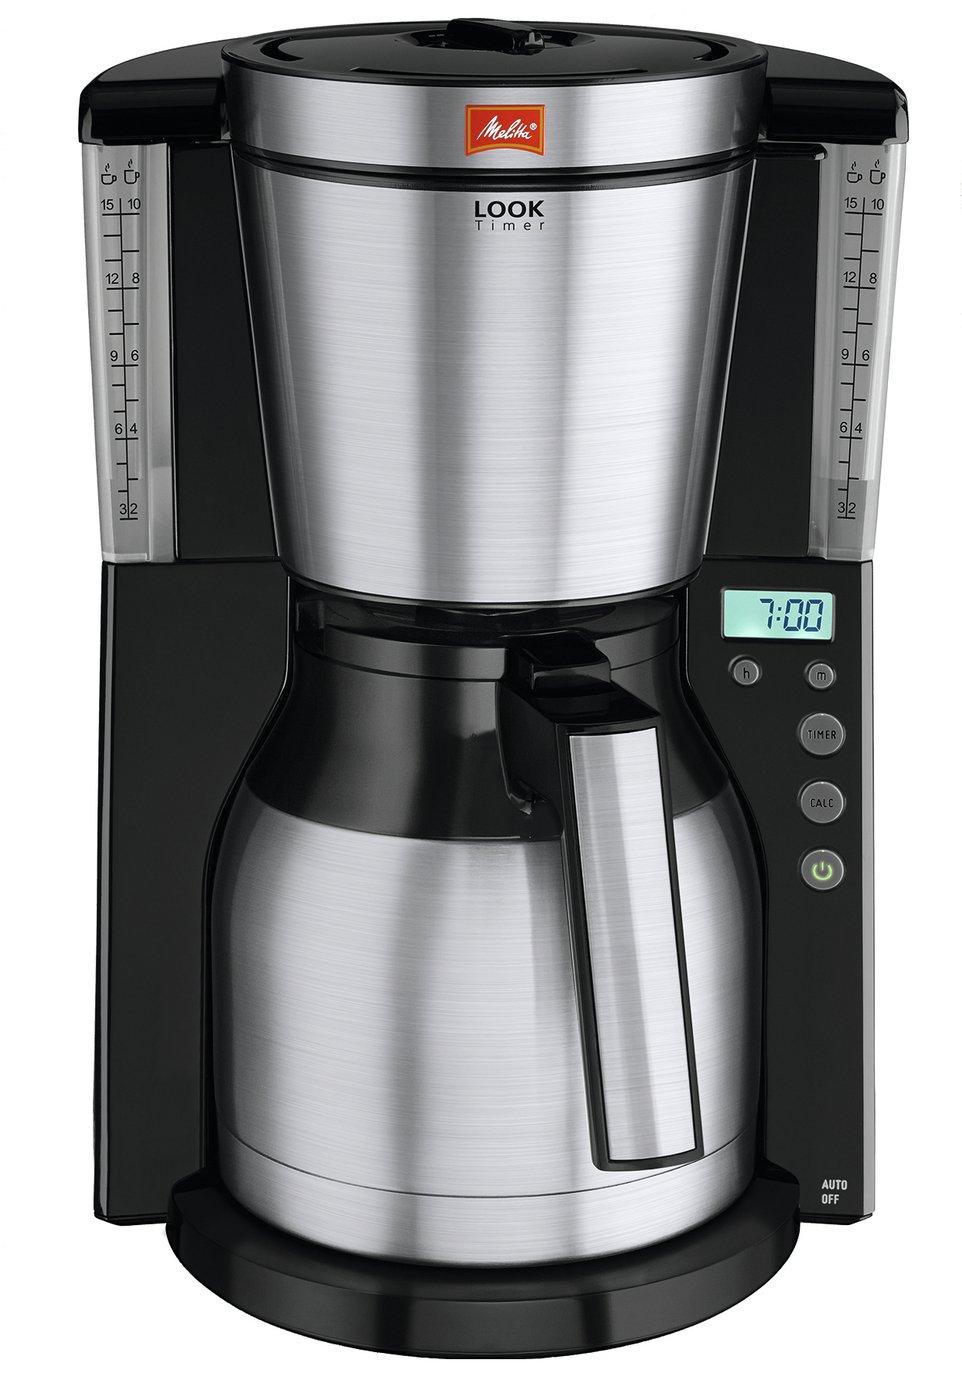 Melitta 1011-16 LOOK Thermal Timer Filter Coffee Machine